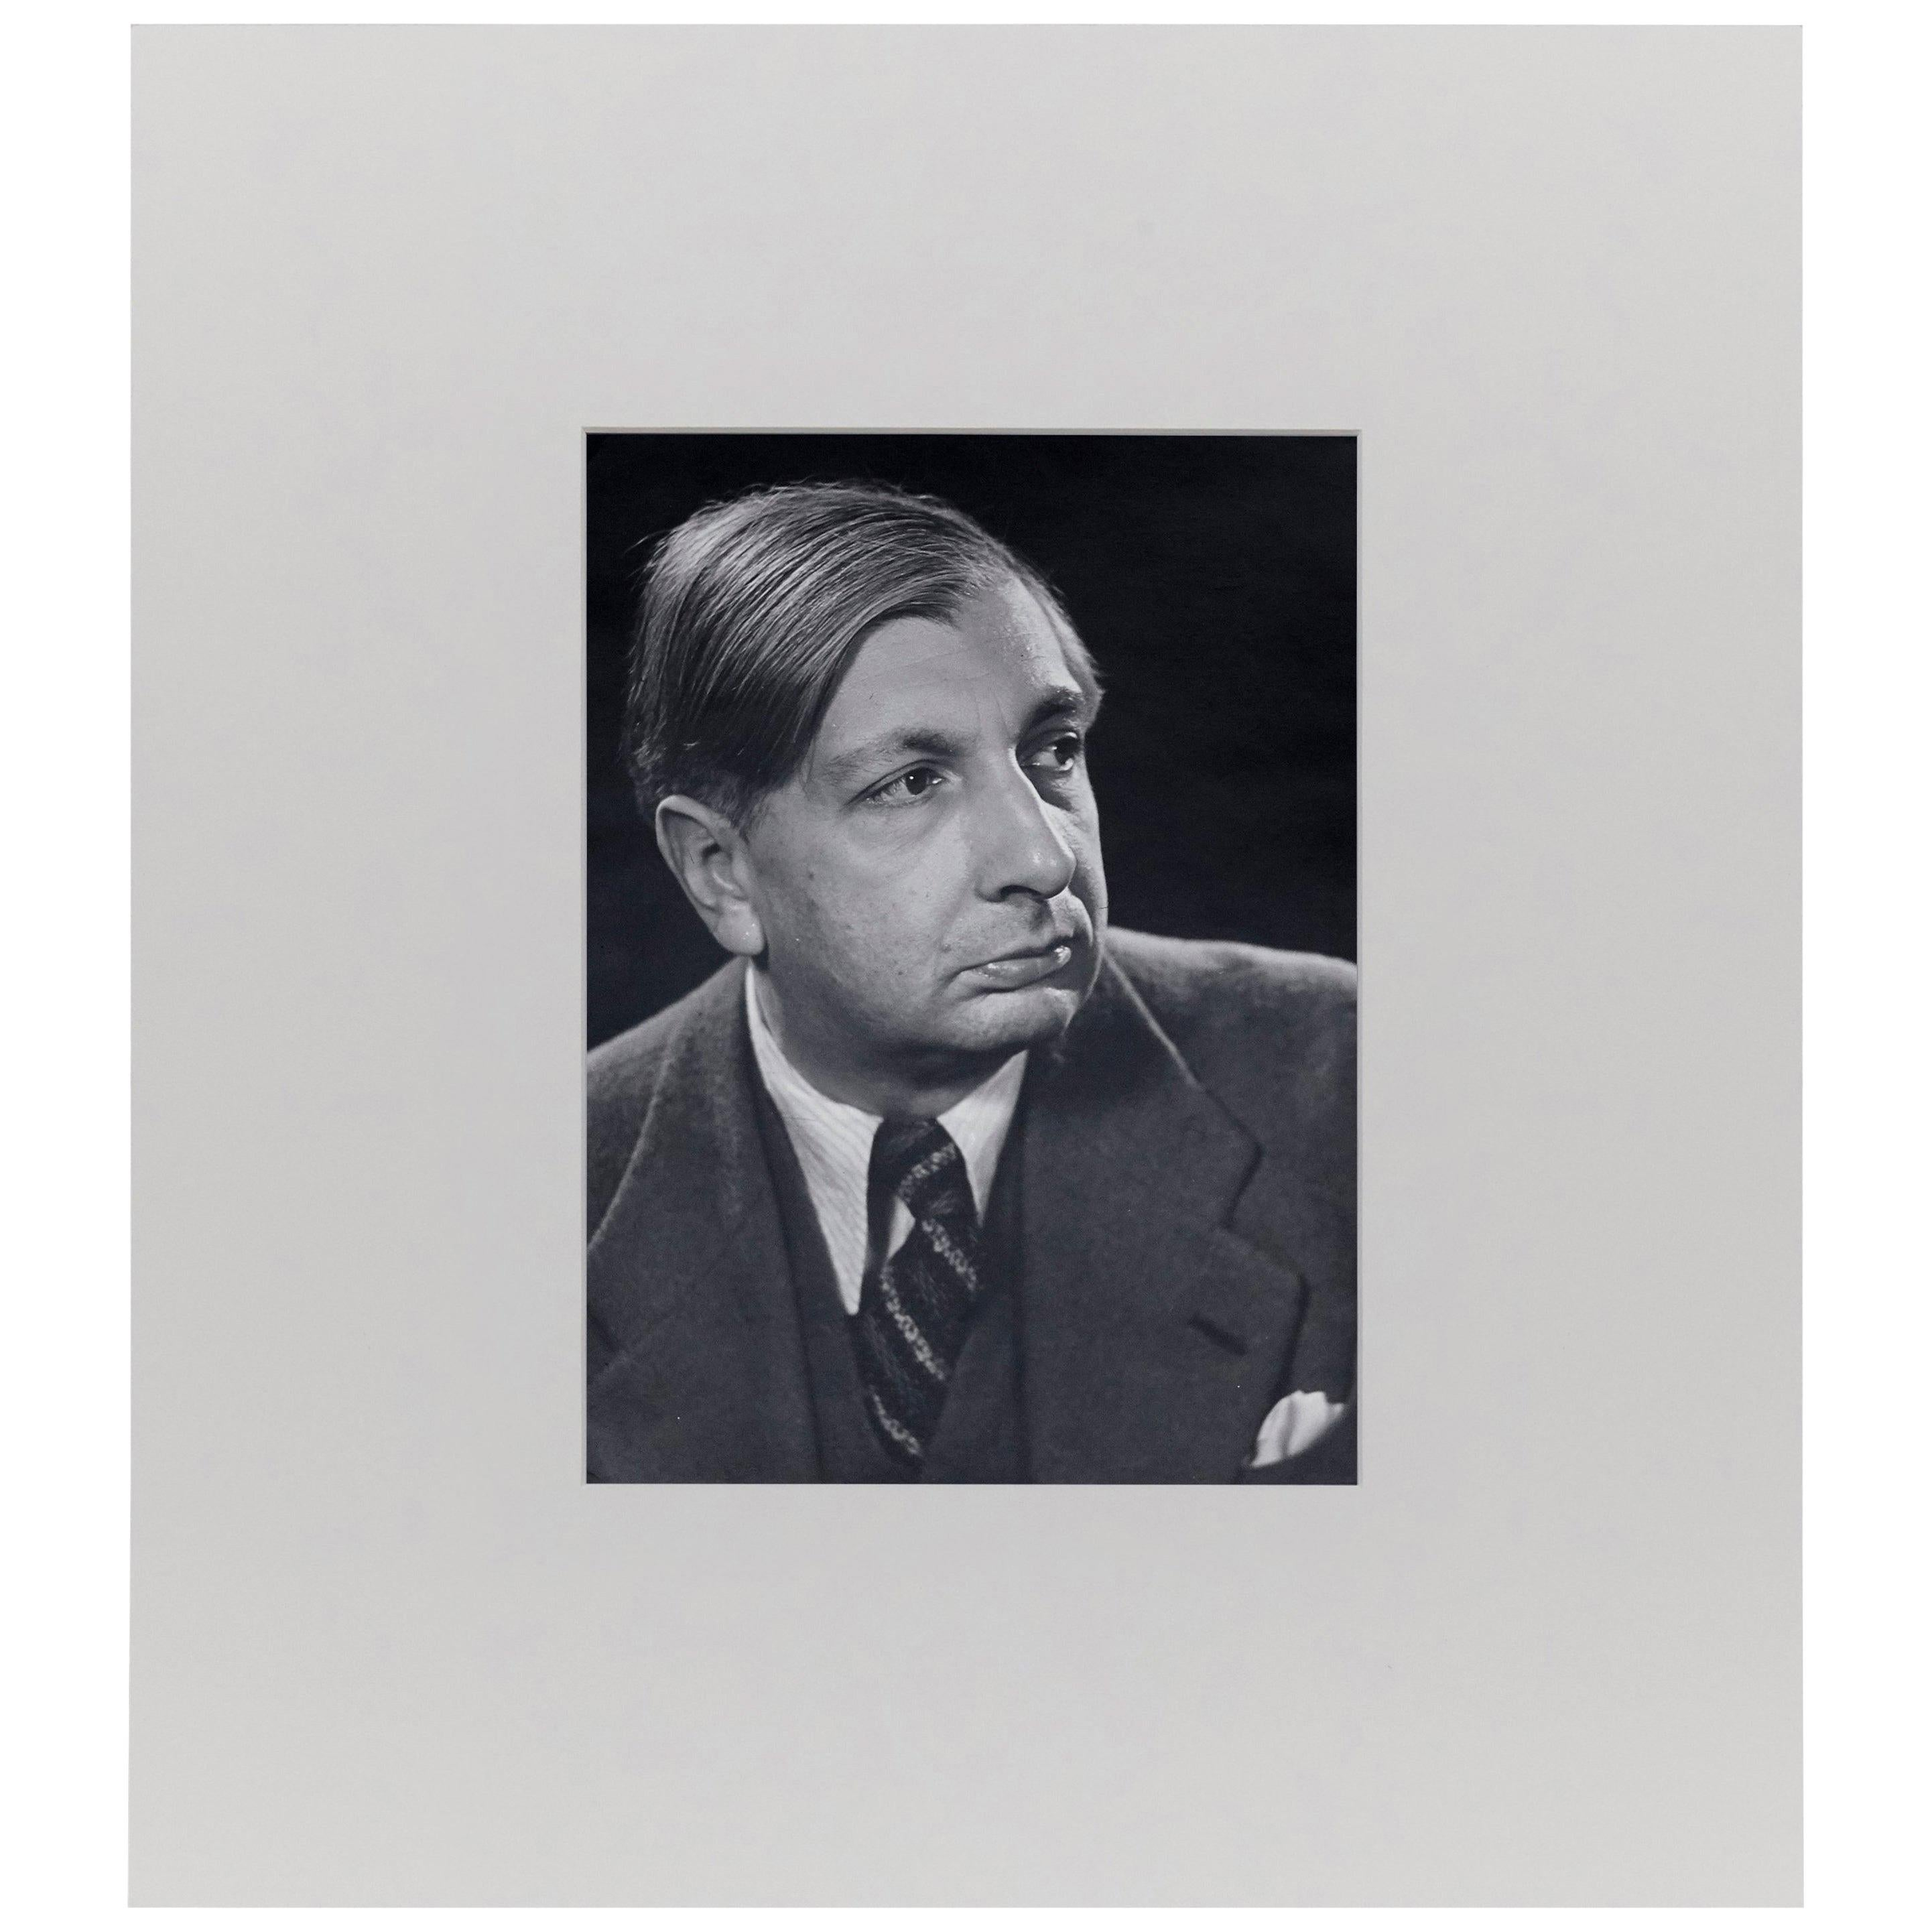 Man Ray Surrealist Portrait Photography of Giorgio De Chirico